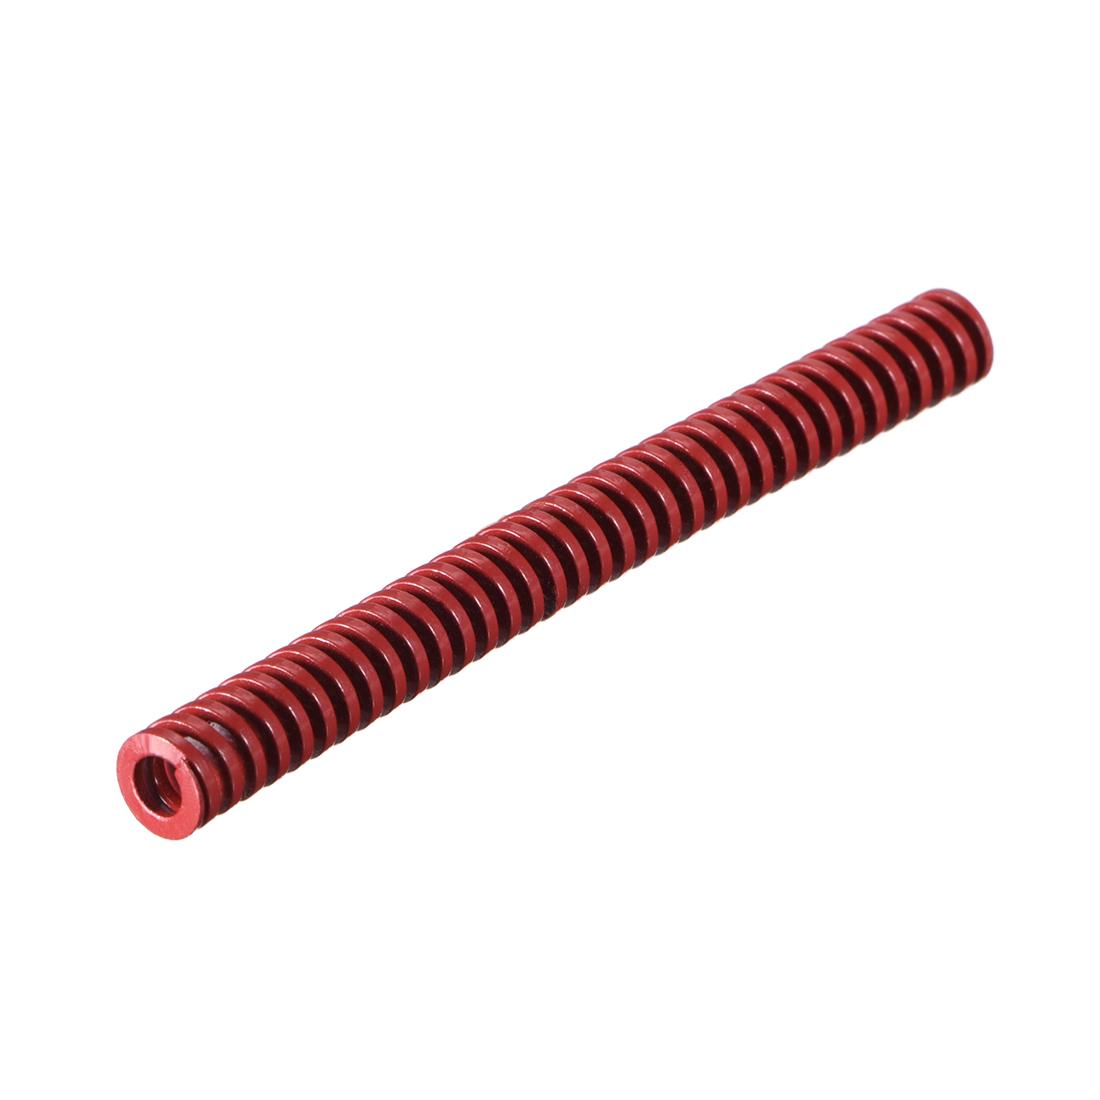 6mm OD 60mm Long Spiral Stamping Middle Load Compression Mould Die Spring 1Pcs - image 2 of 2